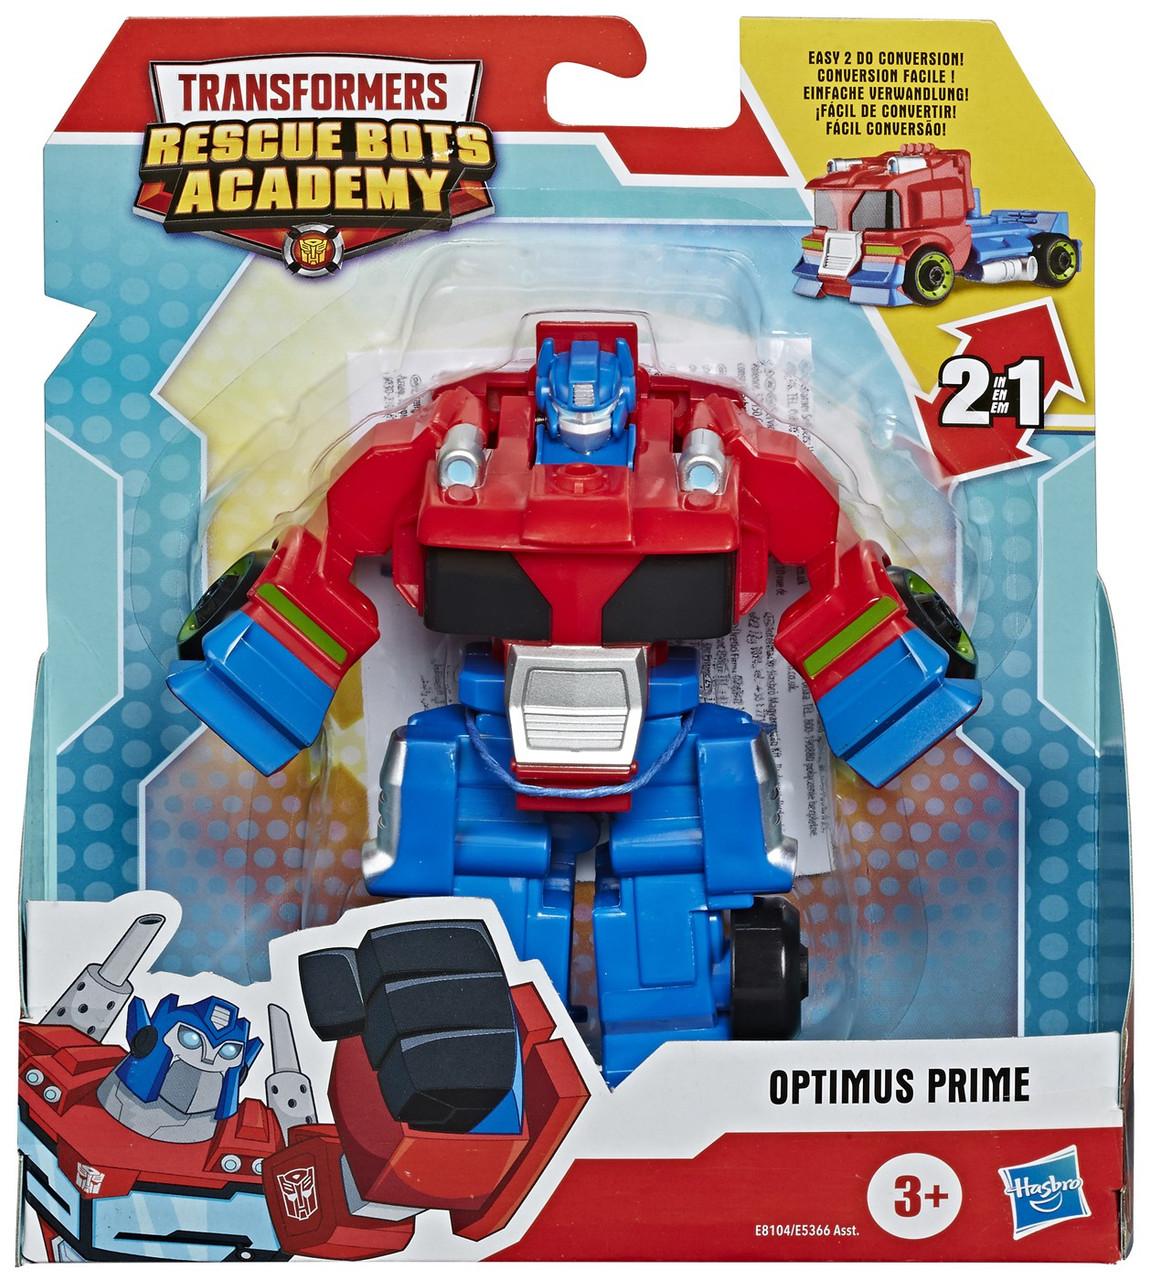 Transformers Rescue Bots Rescan Figure Playskool Heroes